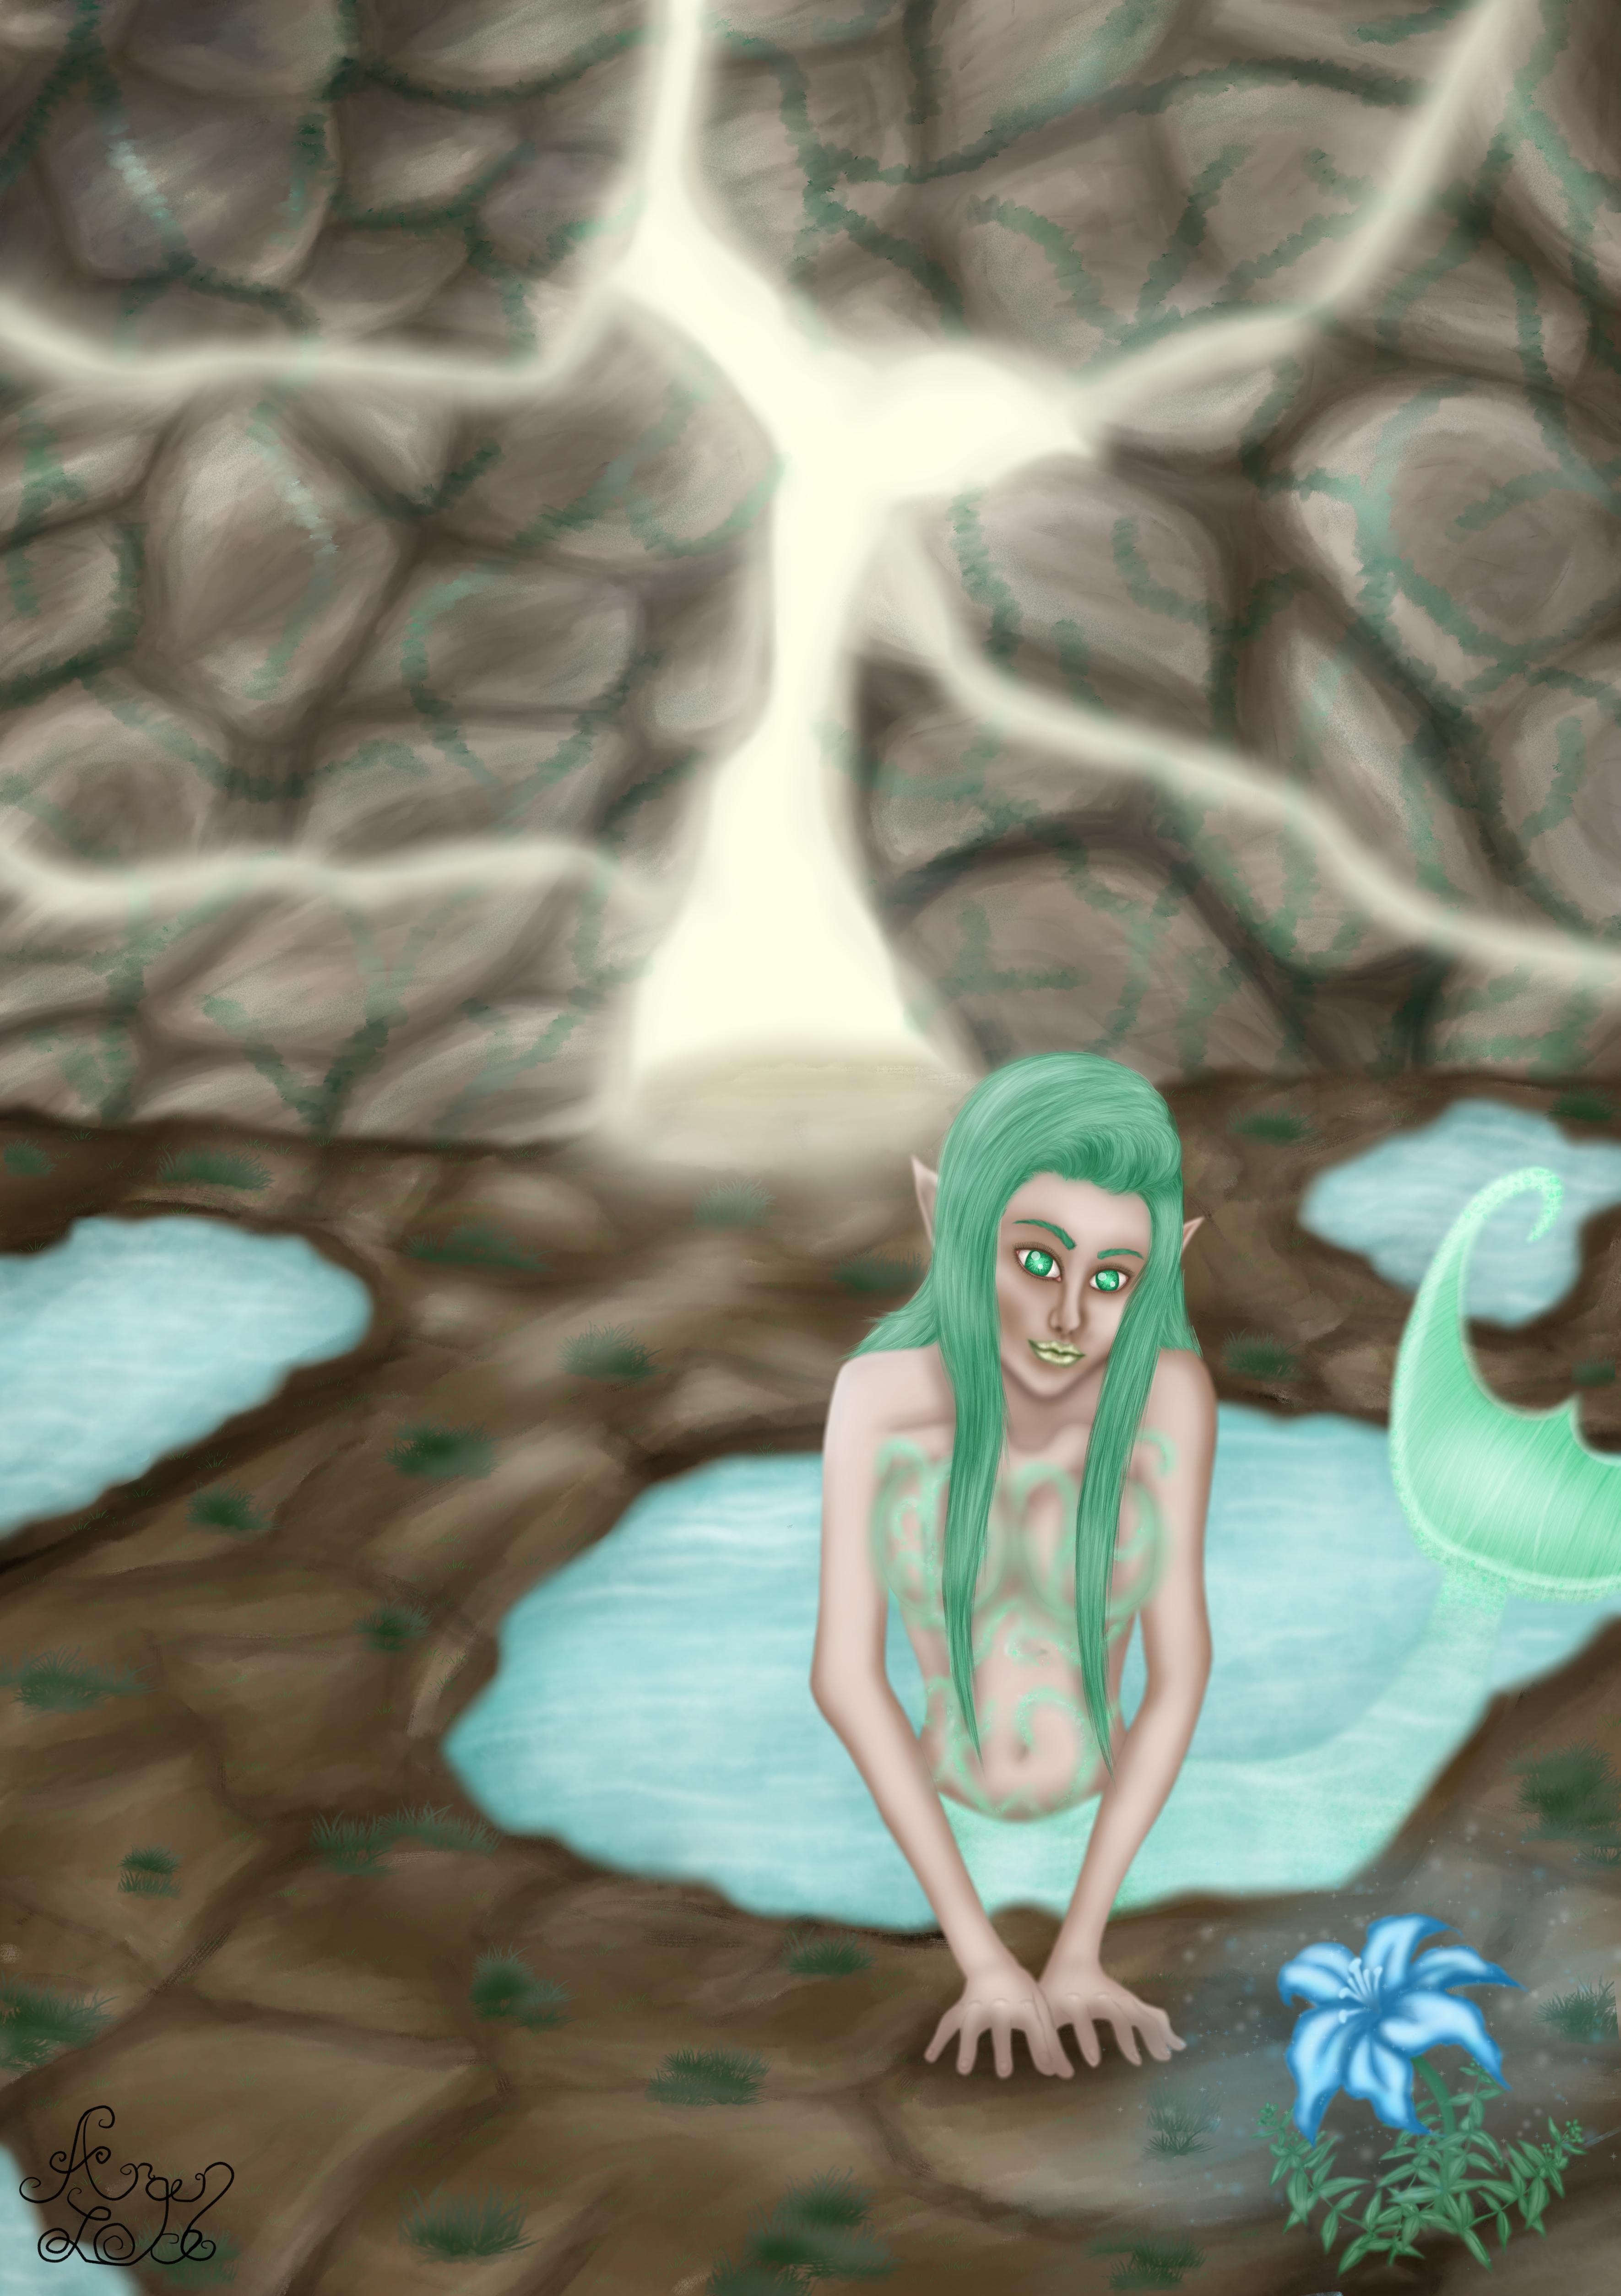 Siren's Addiction by Arqenloce